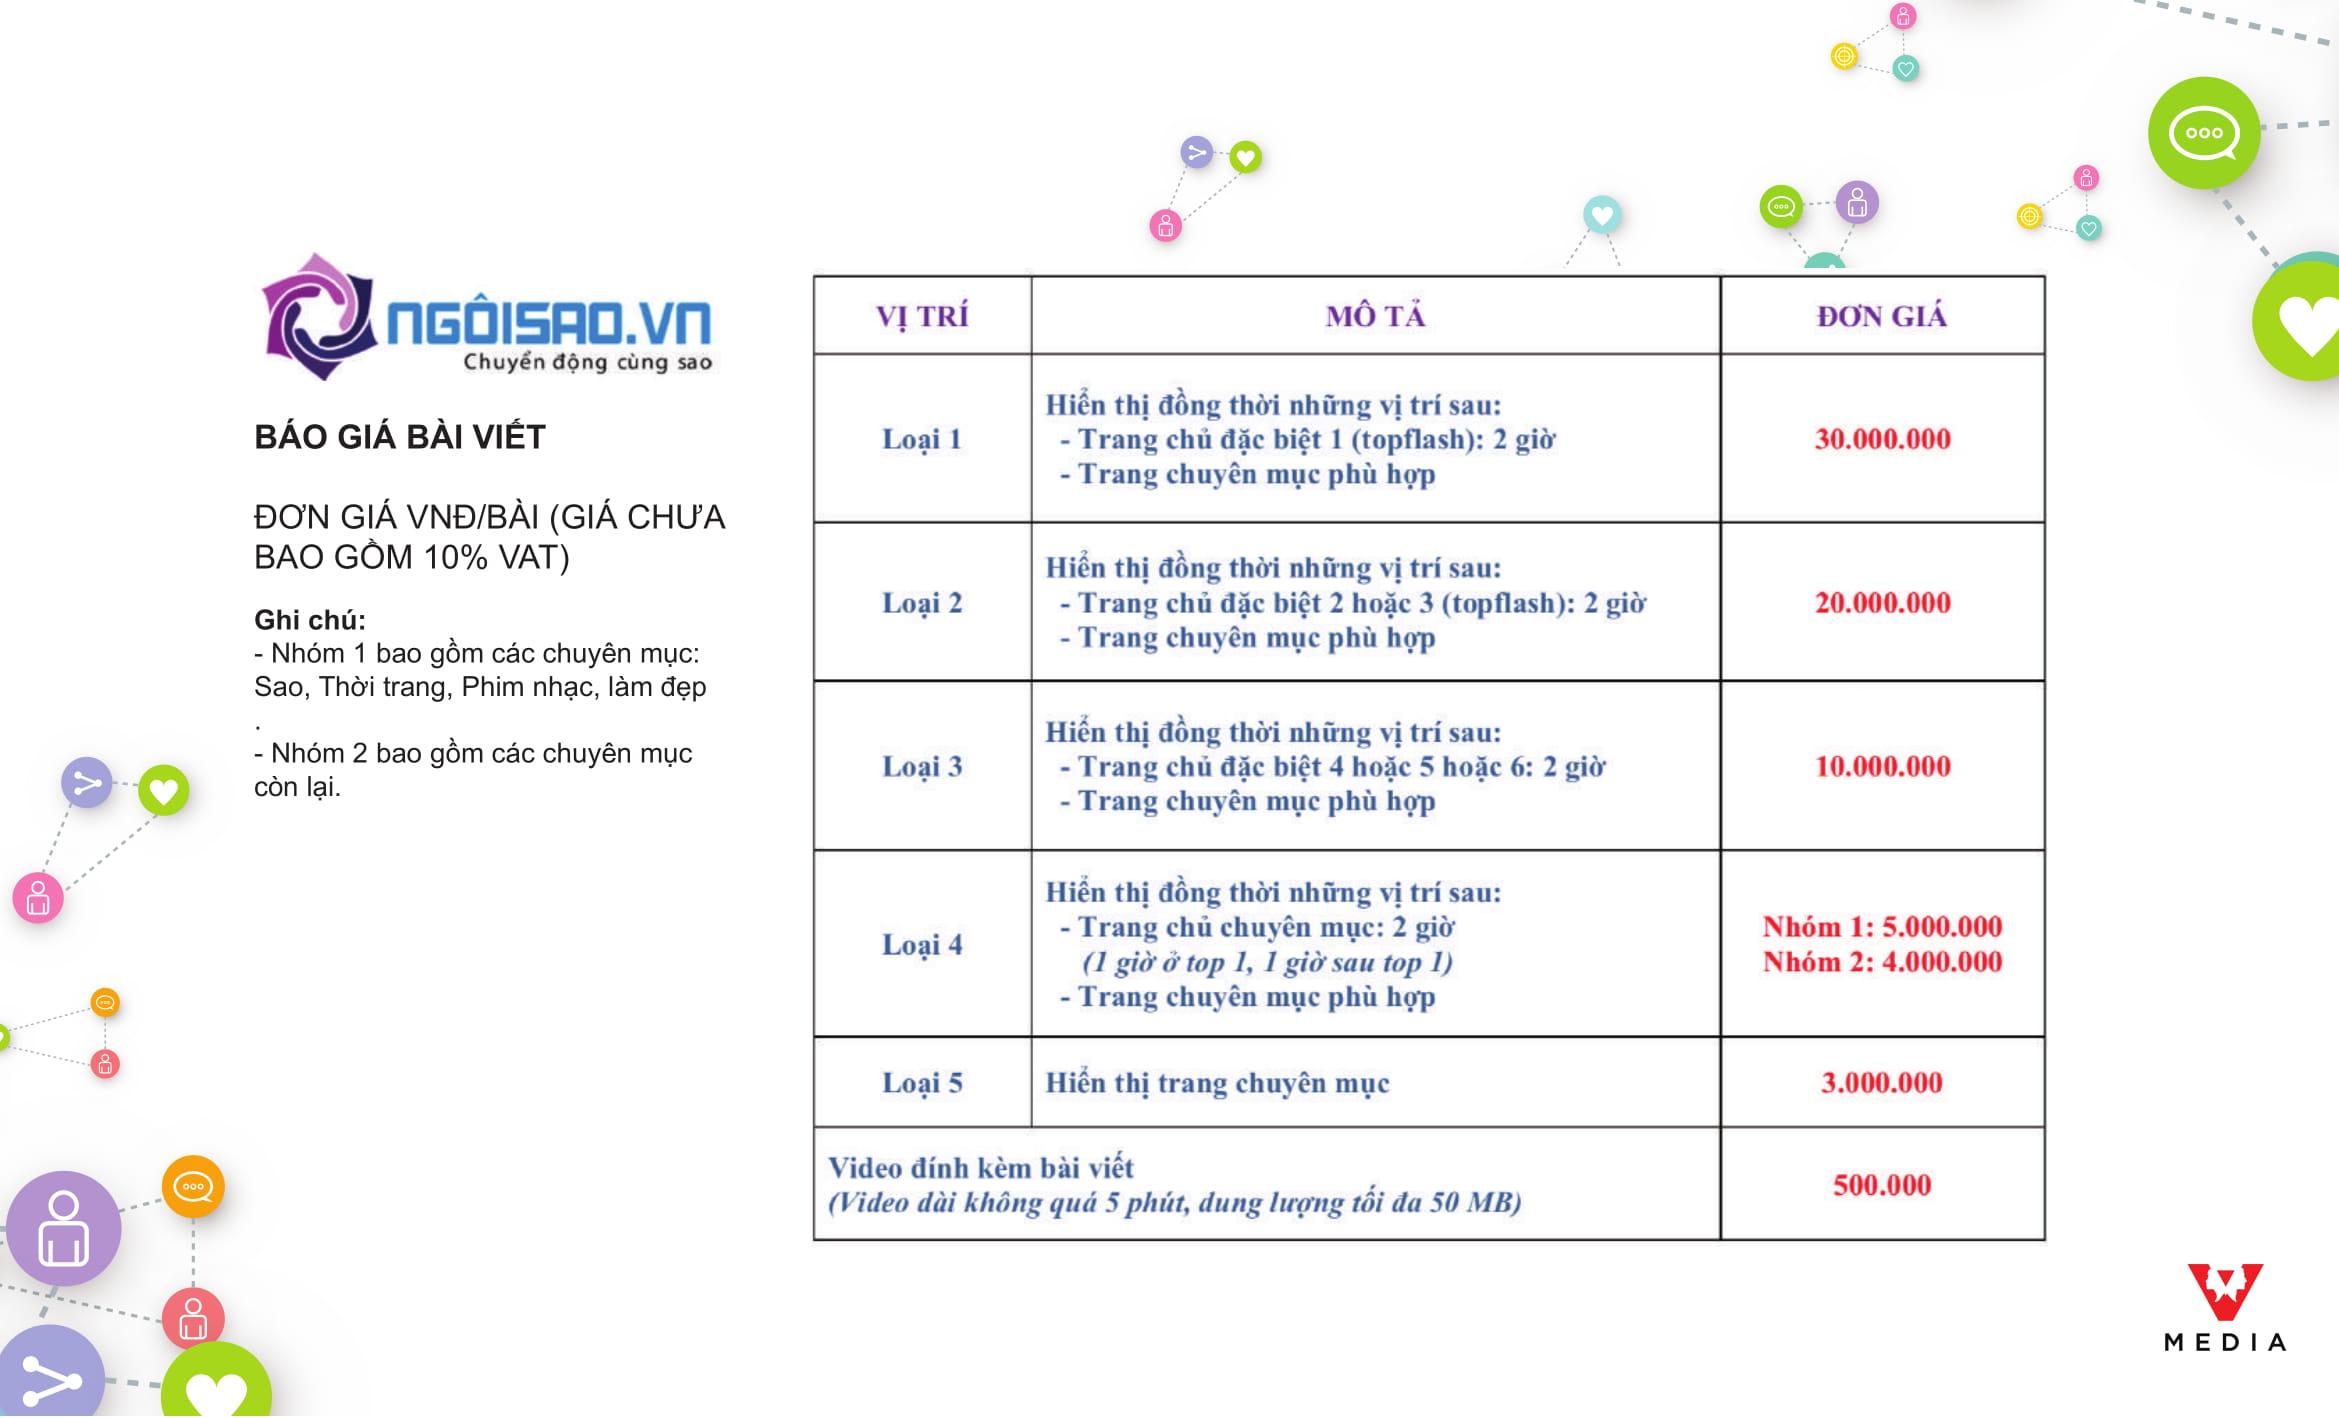 vmediaprensent-compressed-09-ngoisao.vn-w2339-h1418 6